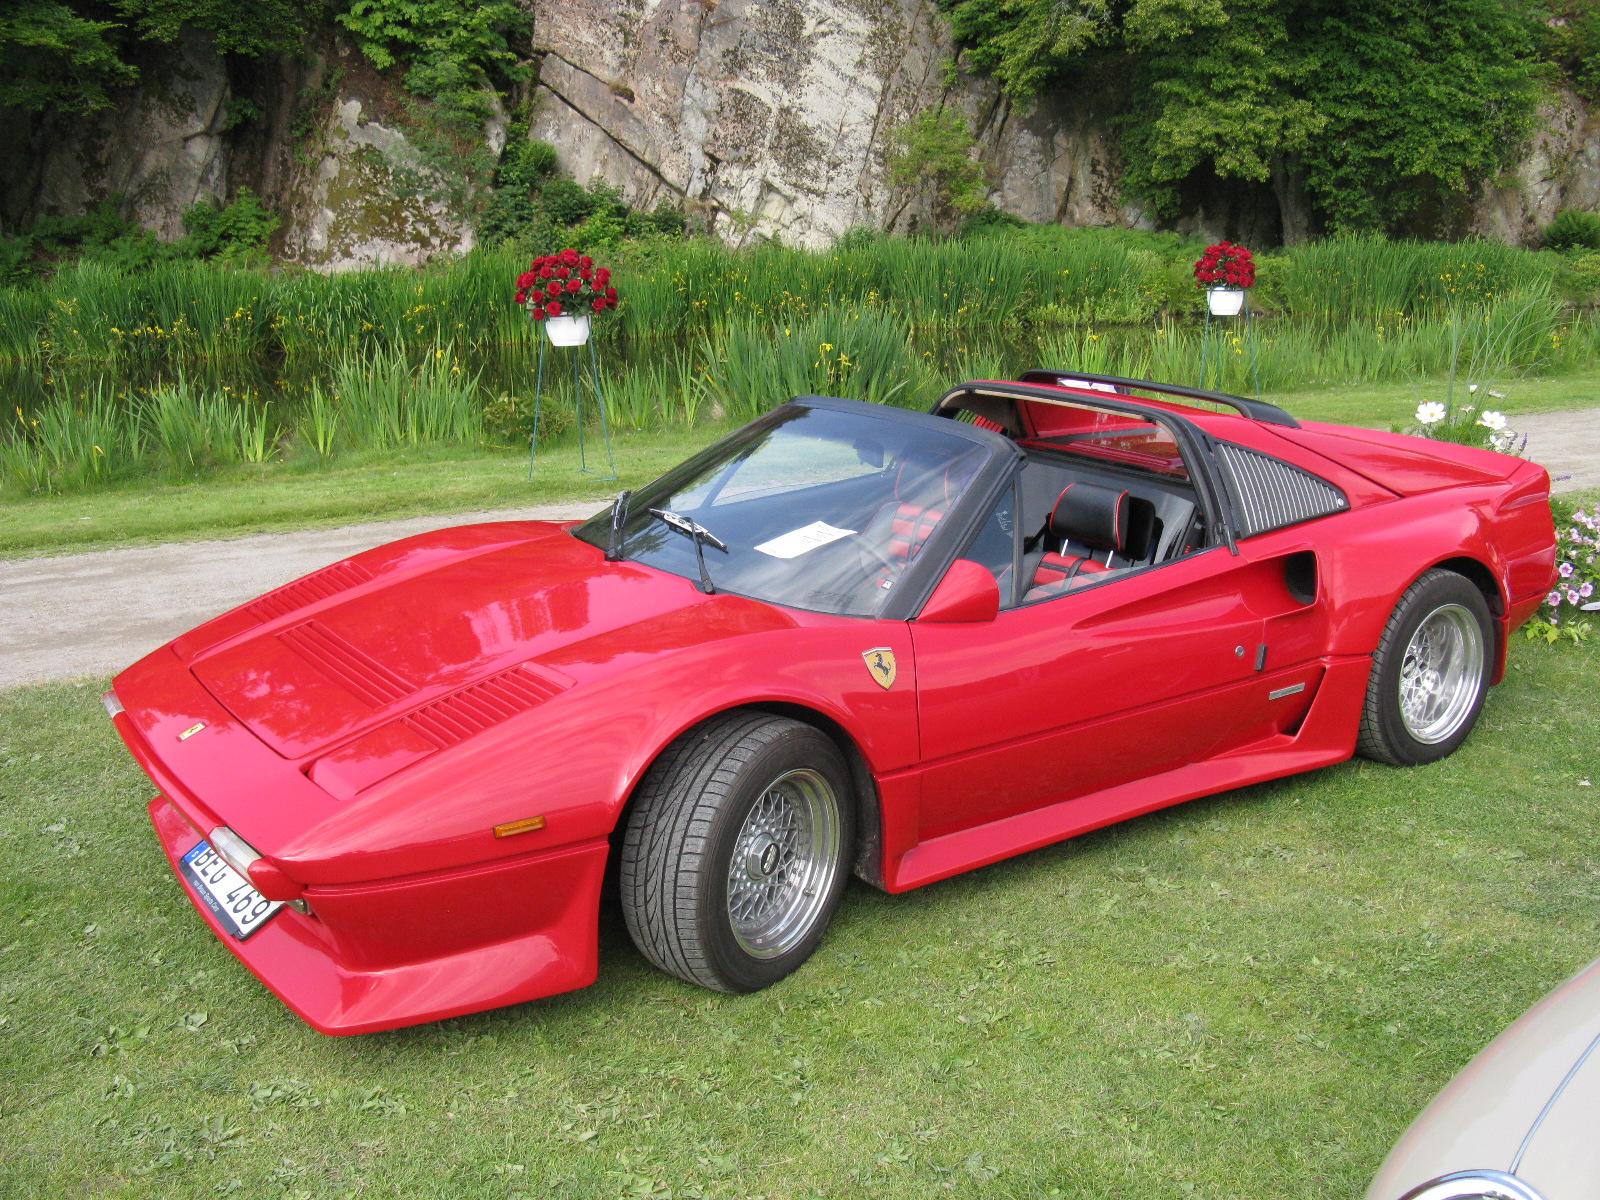 Ferrari 308 Wiring Diagram Trusted Diagrams Buick Reatta File Gts Koenig Specials 7606590718 Wikimedia